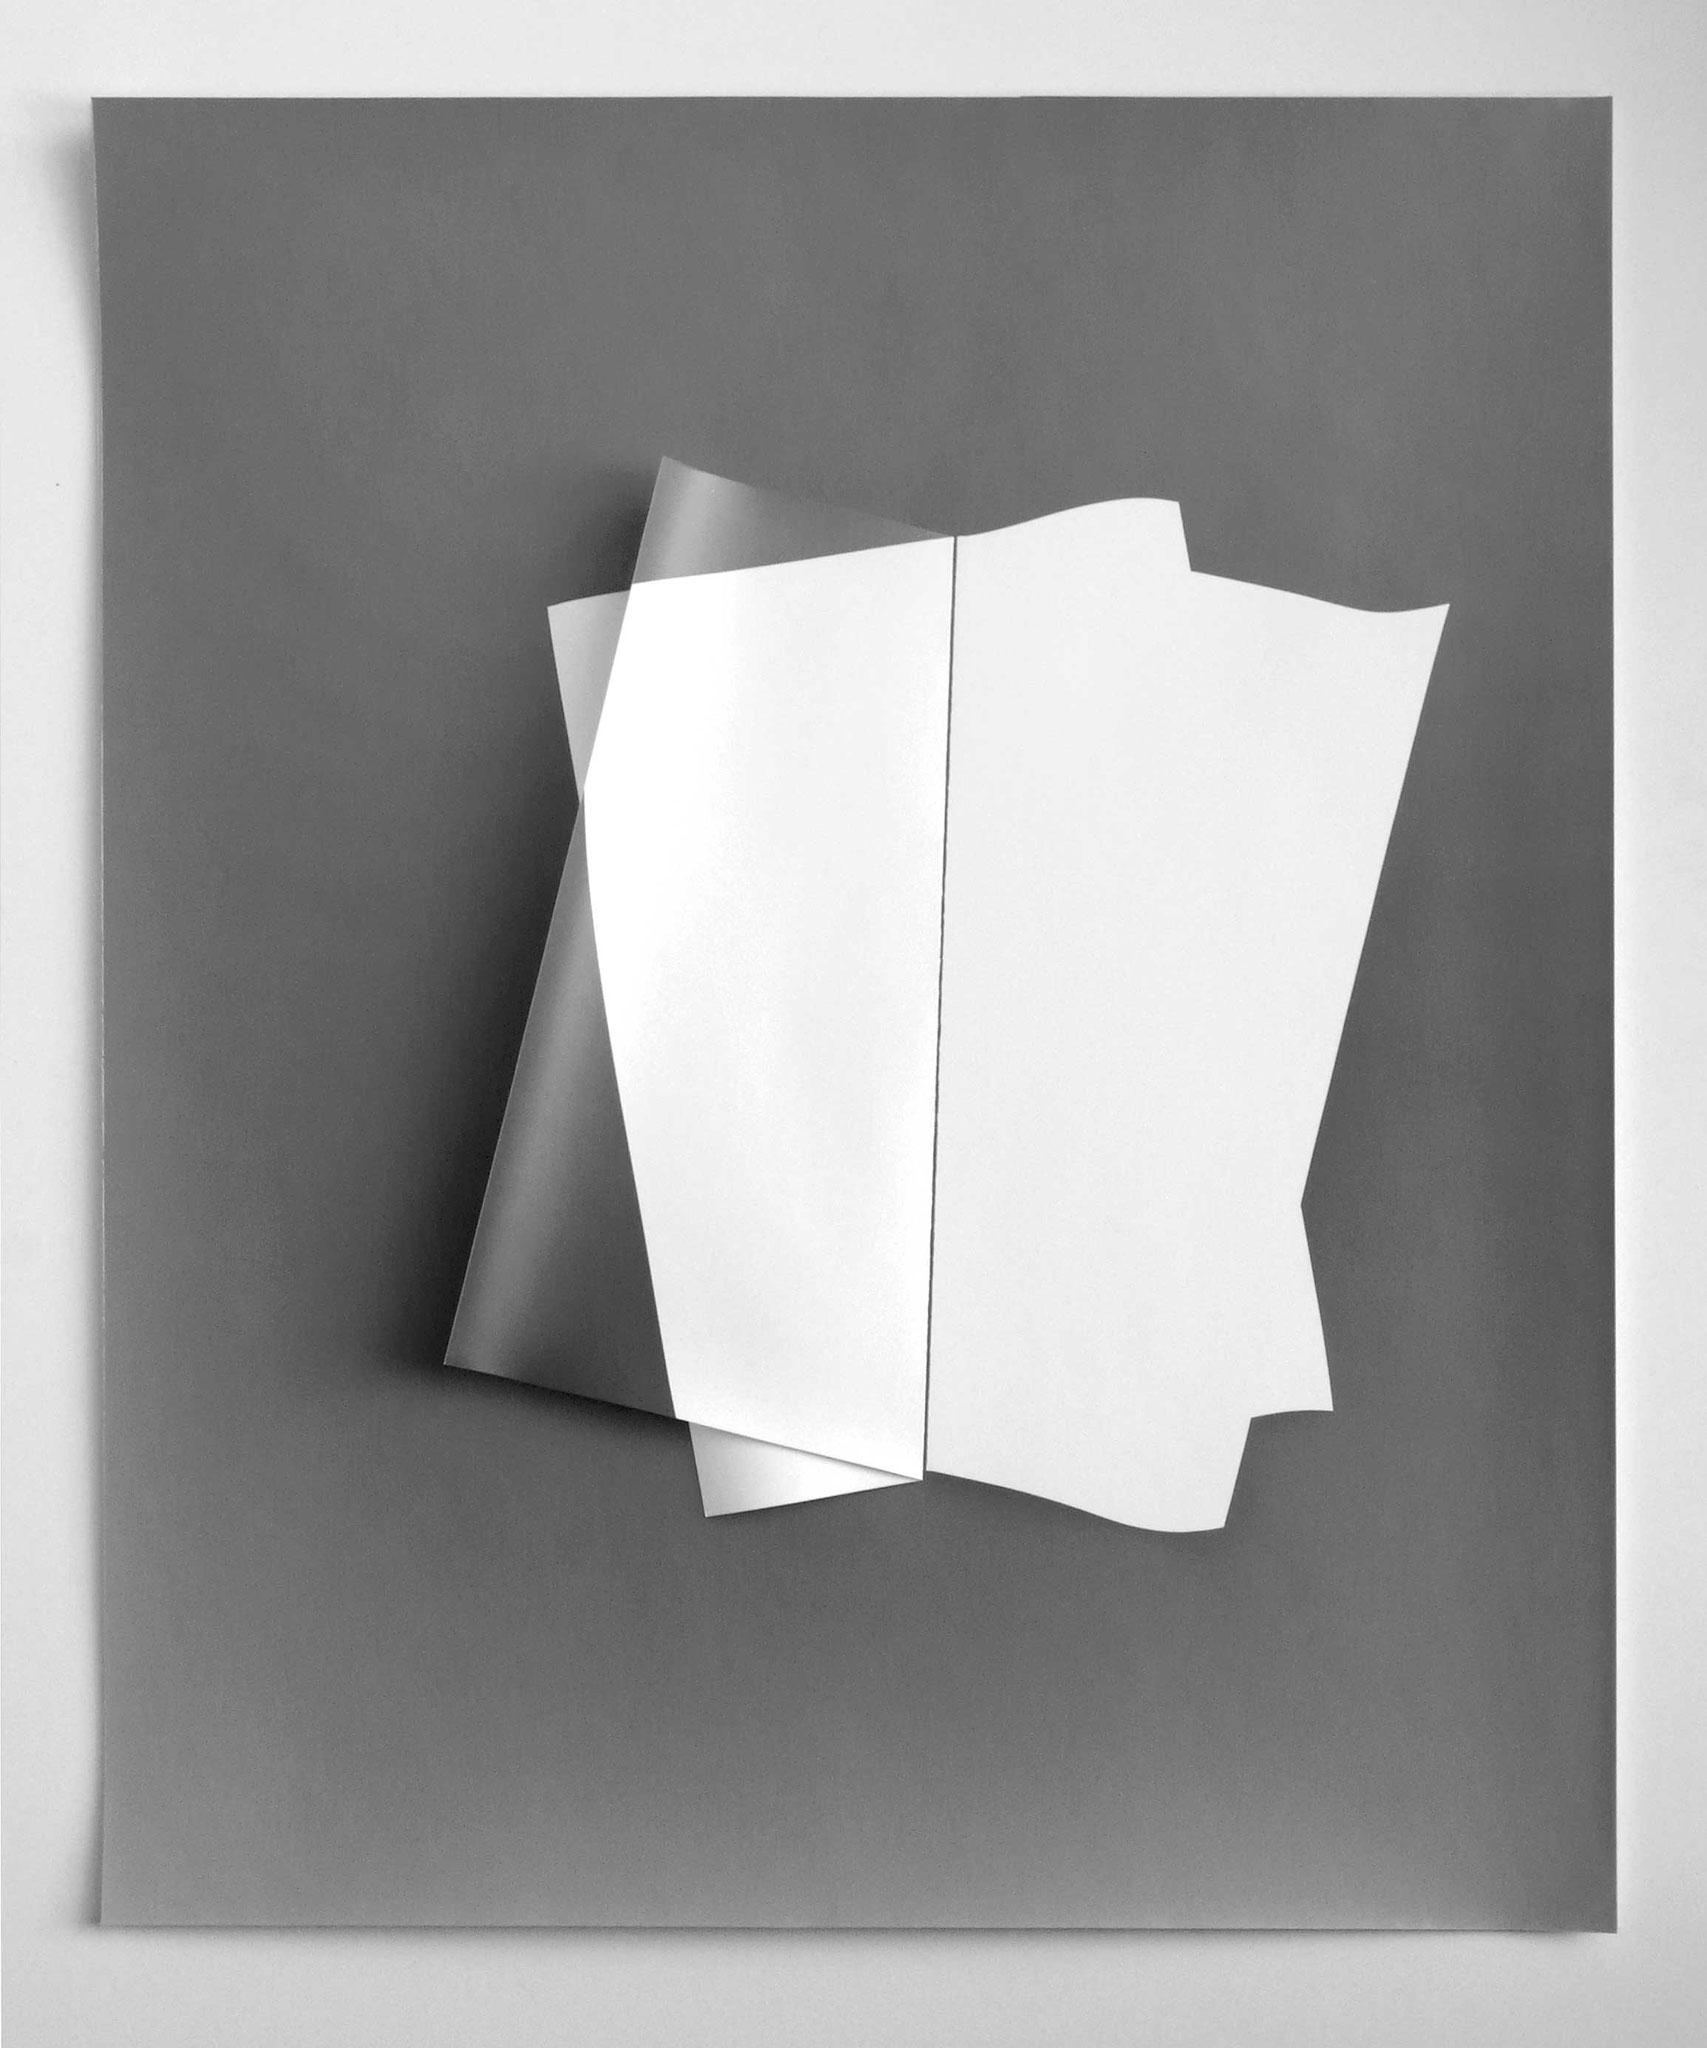 o.T. Fotopapierarbeit III-1-2, 2011. 50 x 60 cm